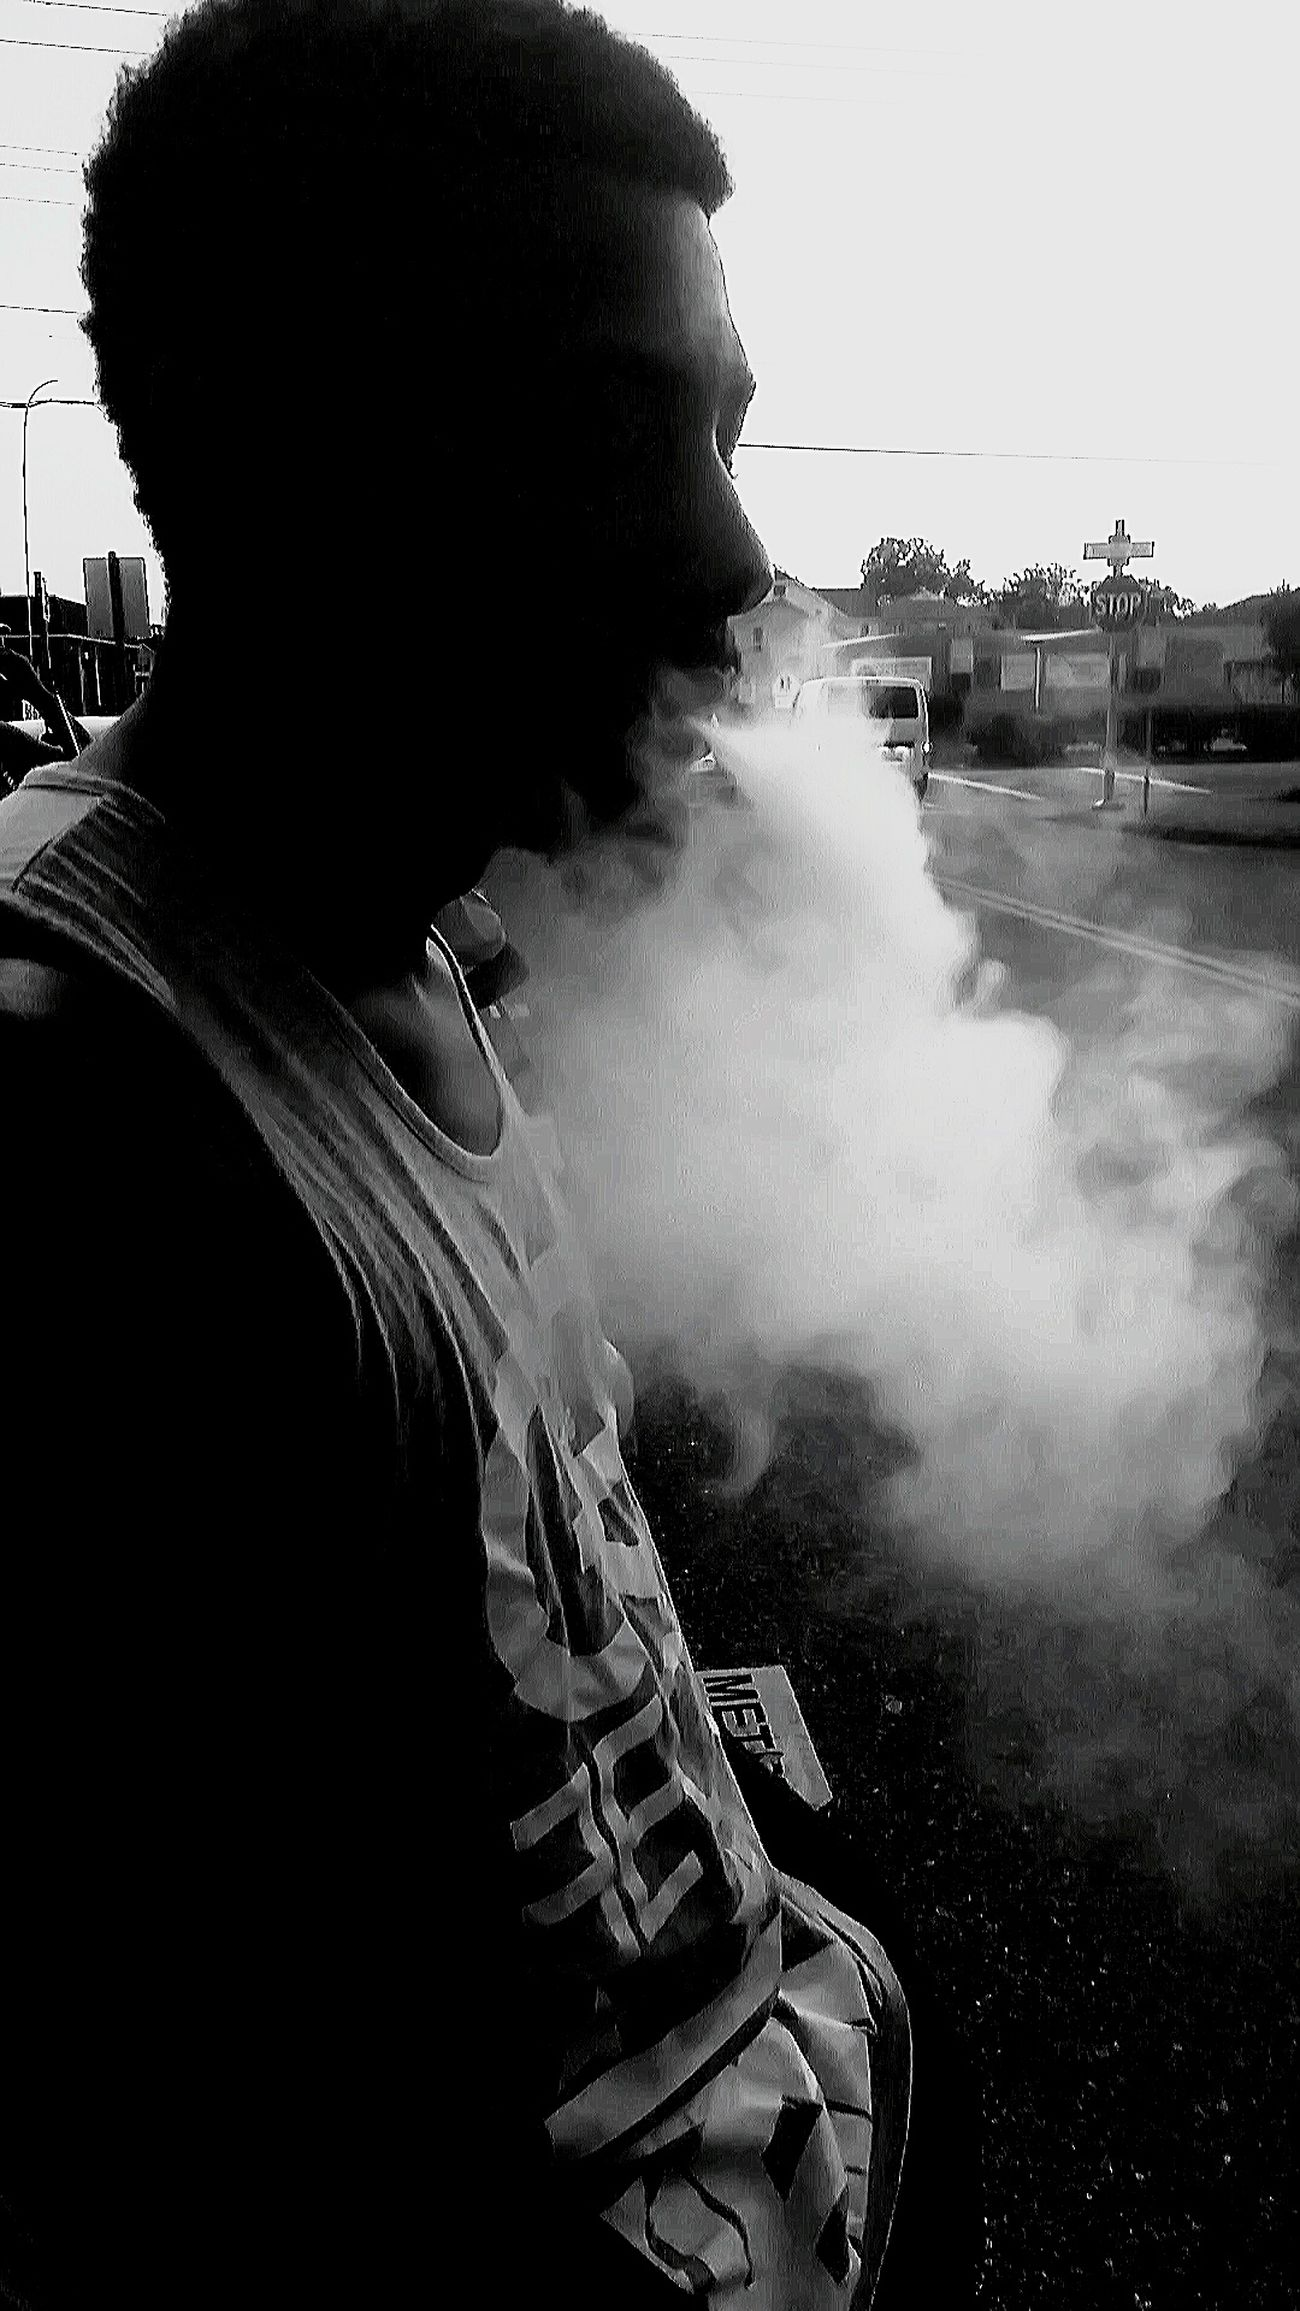 One Person Adults Only Adult People Standing Close-up Day Smoke Smoked Out Smokebomb The Portraitist - 2017 EyeEm Awards VapeSmoke Vapesociety Vapegram Vapenation Vapetricks Vape4life Vapefam BYOPaper!